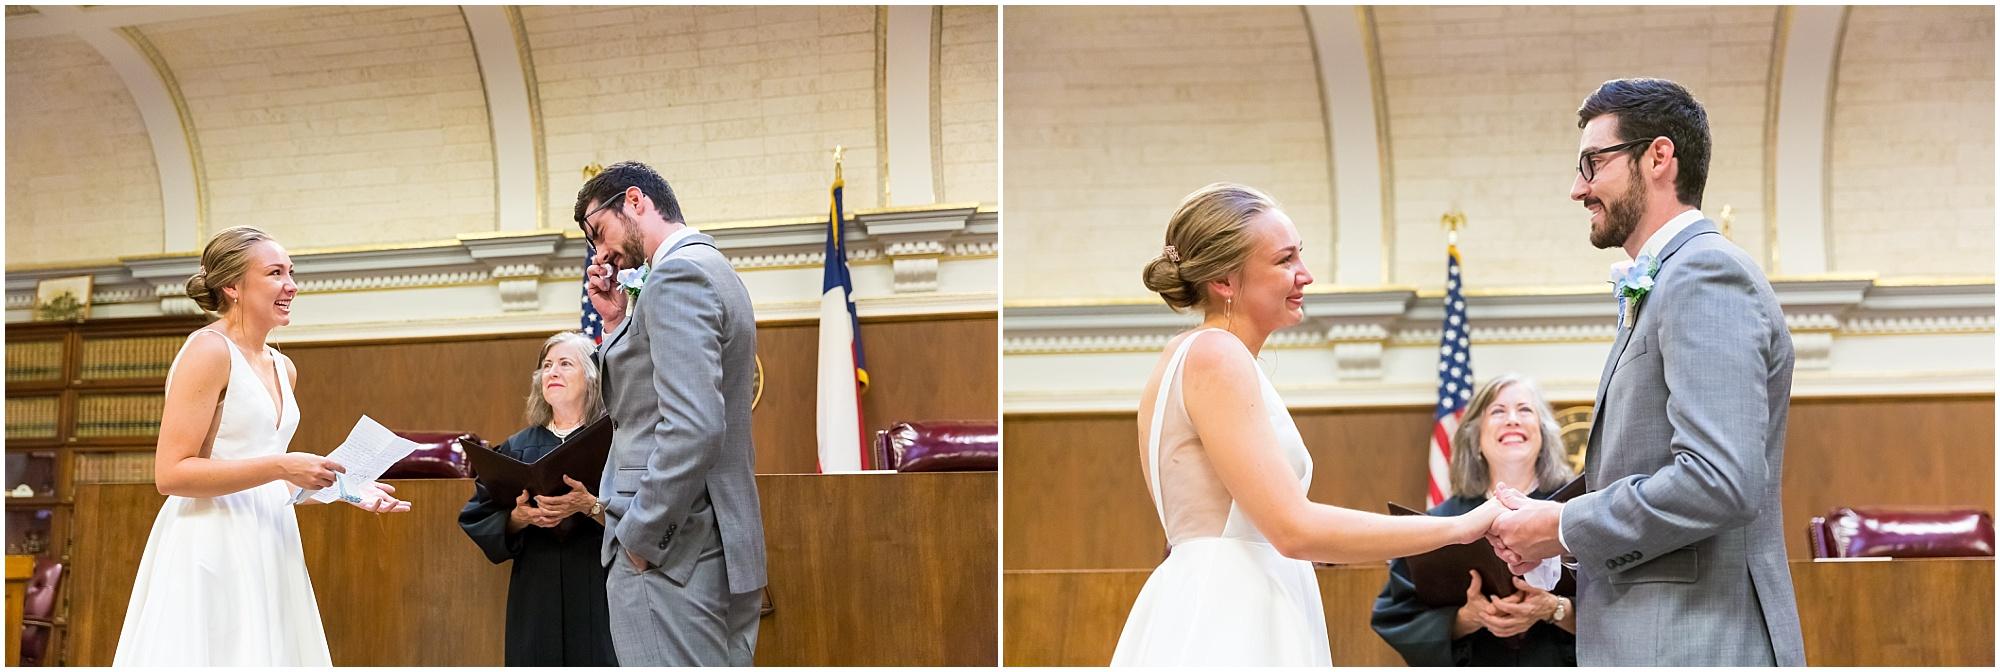 Courthouse-Wedding-Waco-Texas_0013.jpg